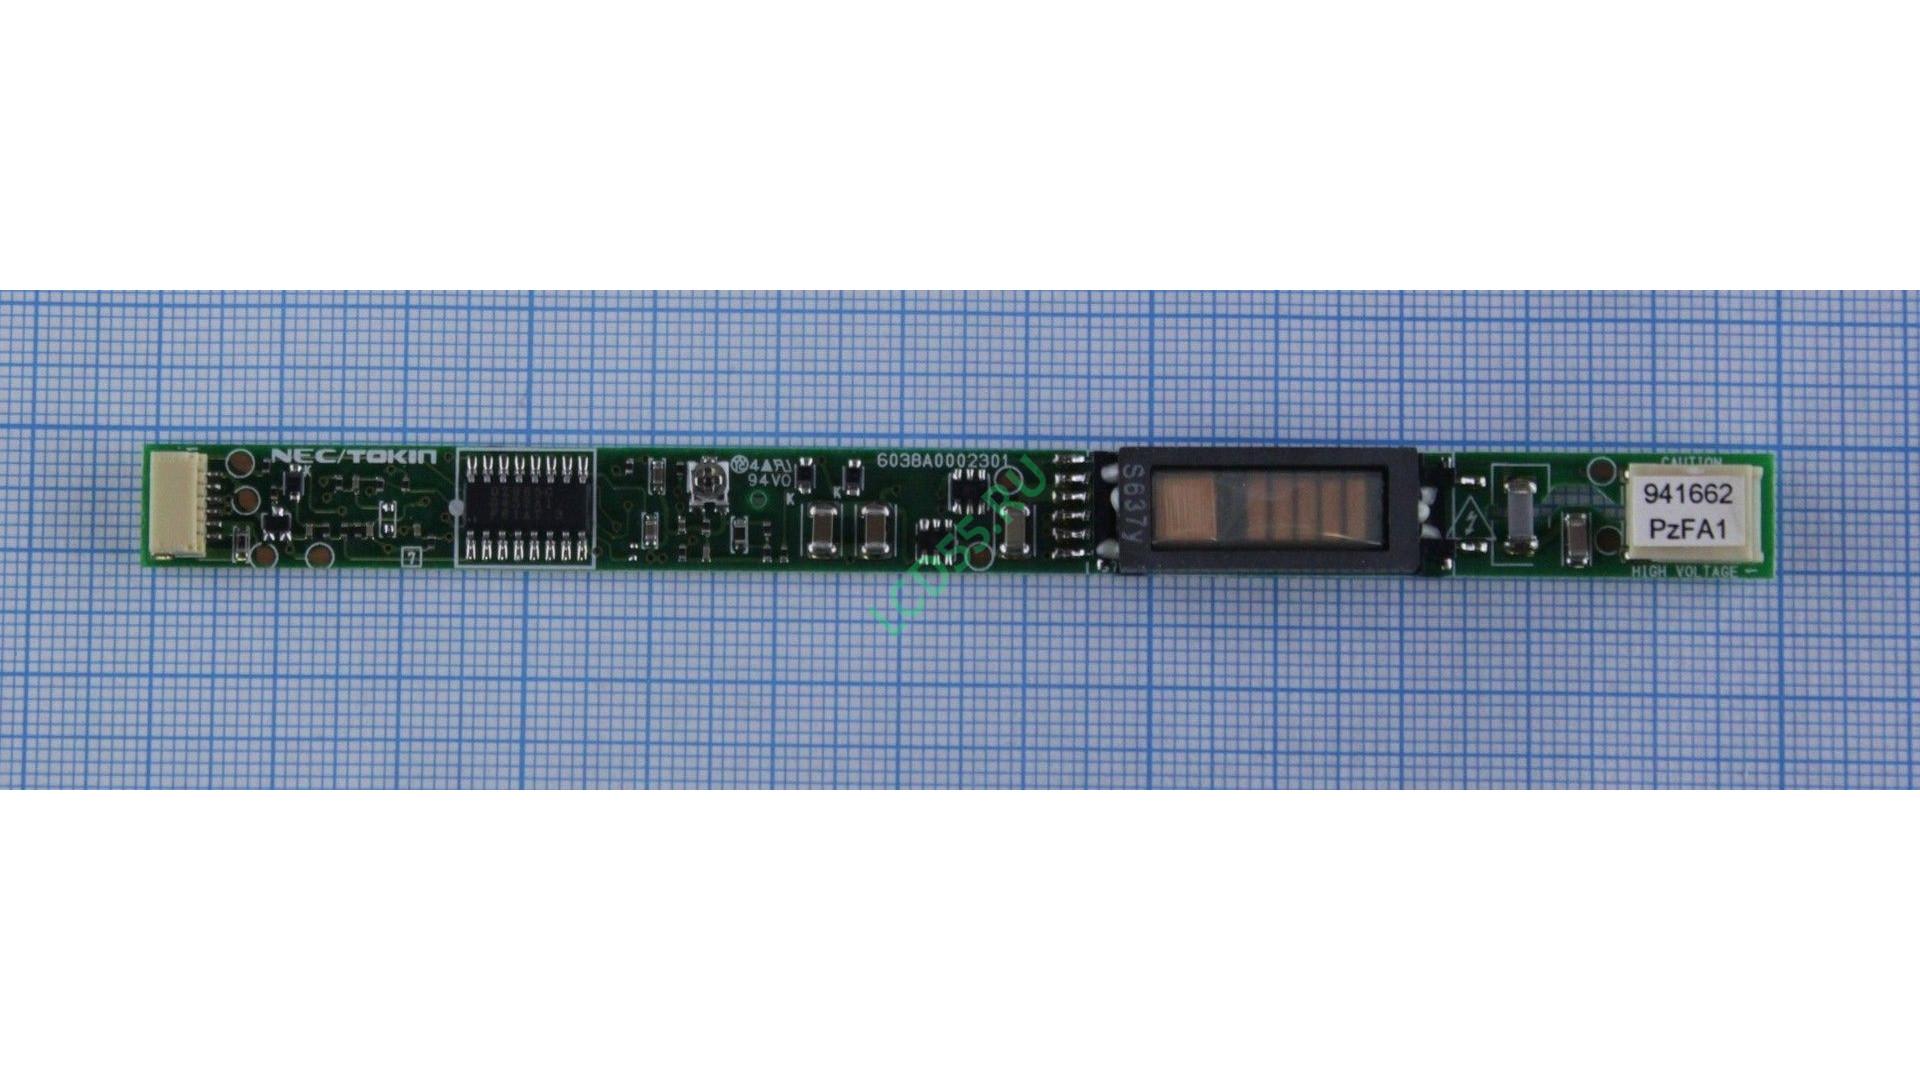 Инвертор Compaq Evo N600c, HP Compaq Nc6000, Nc8000, Nx5000, Presario V1000